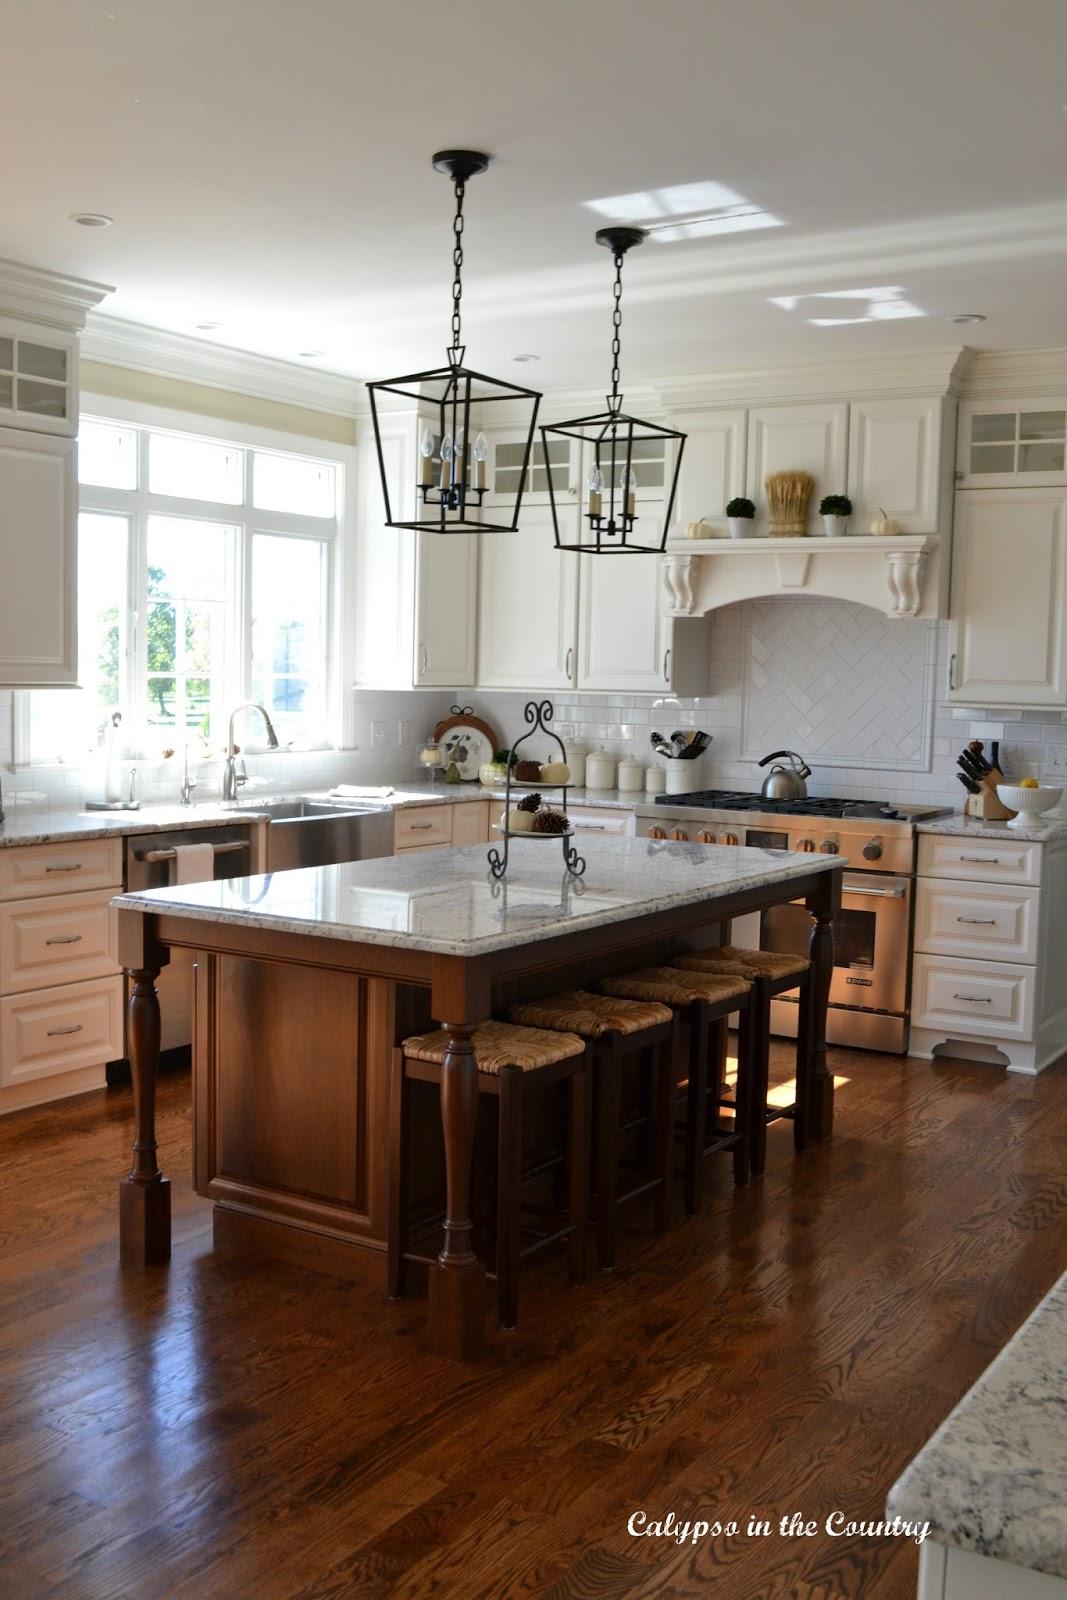 White Kitchen with Cherry Island and Rush Seat Stools